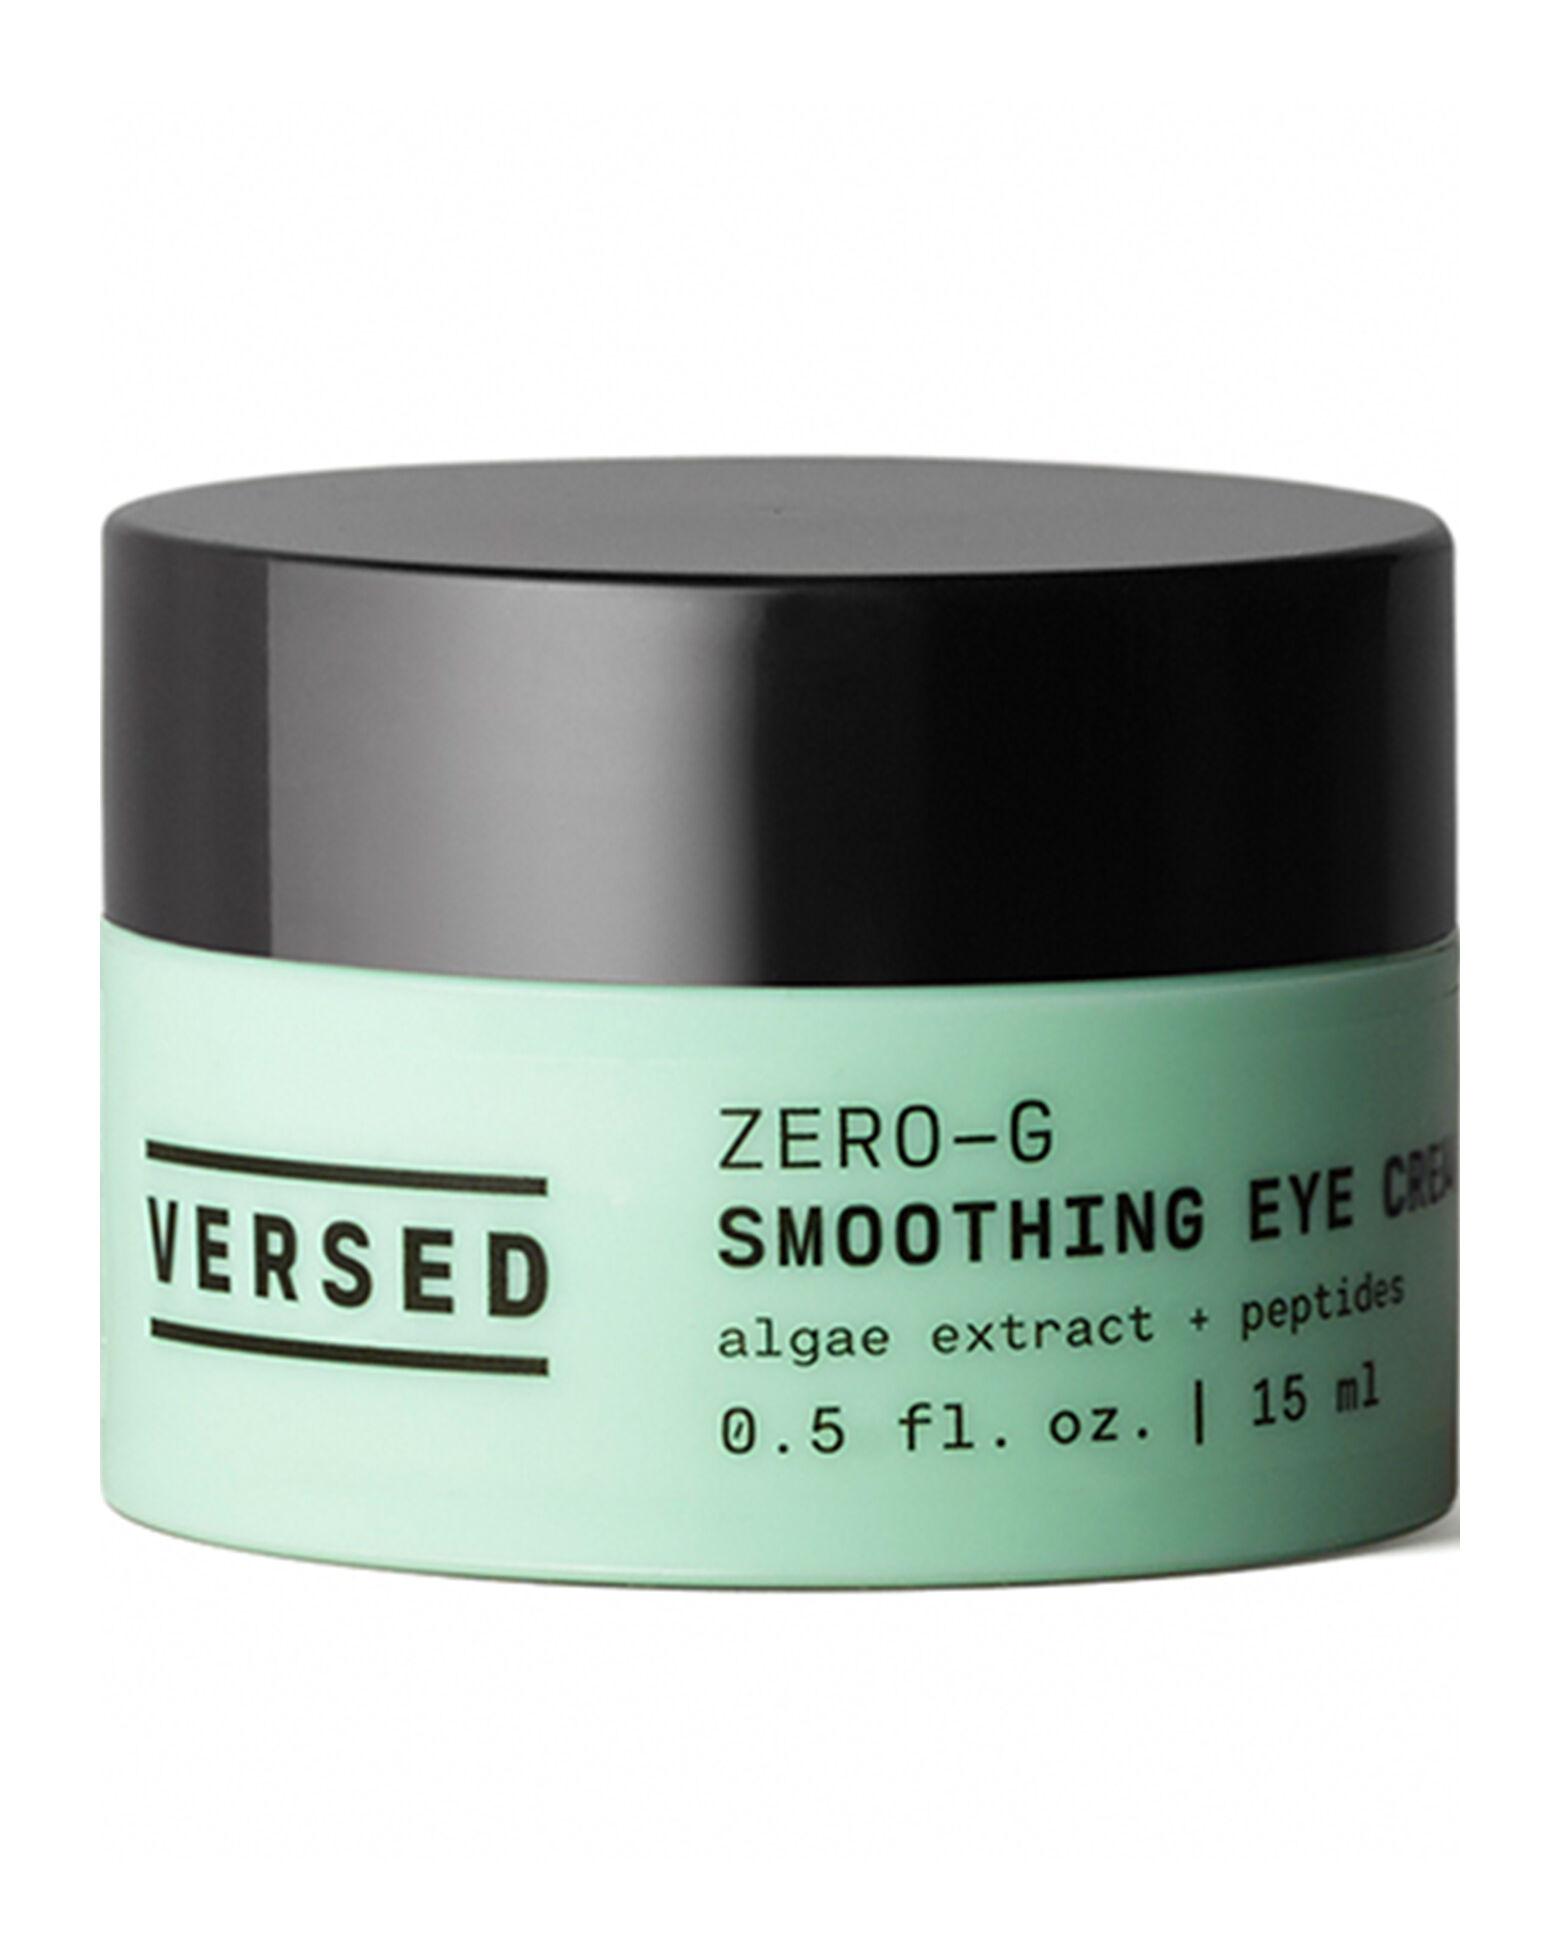 Versed - Zero-G Smoothing Eye Cream